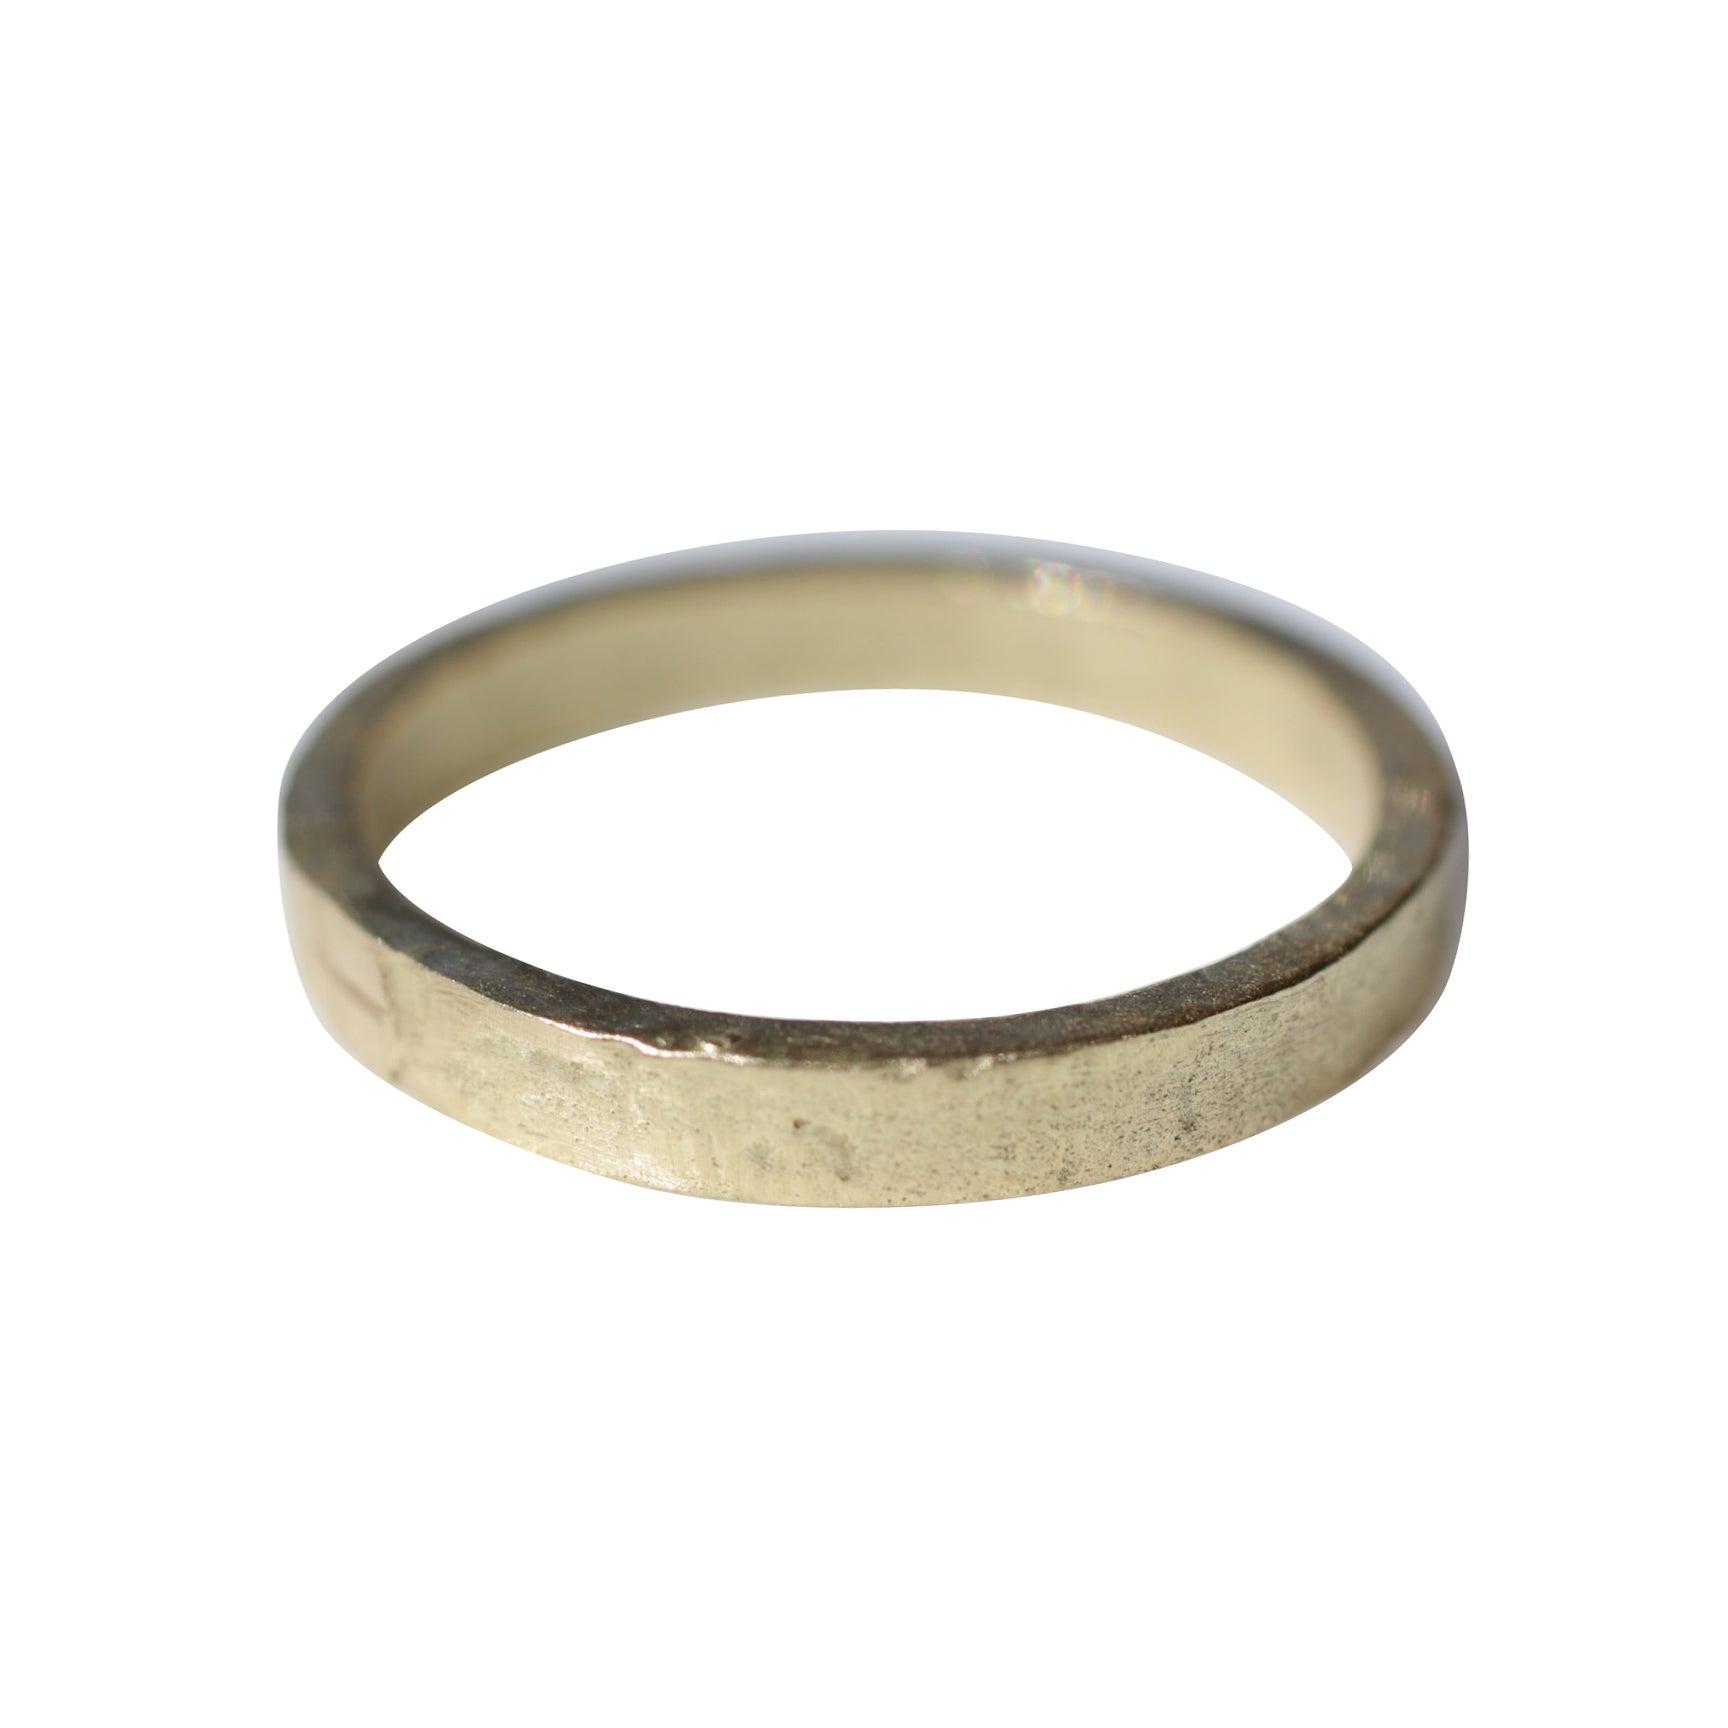 Bridal Wedding 18 Karat Gold Ring, Wide Stacking Contemporary Unisex Band Men's